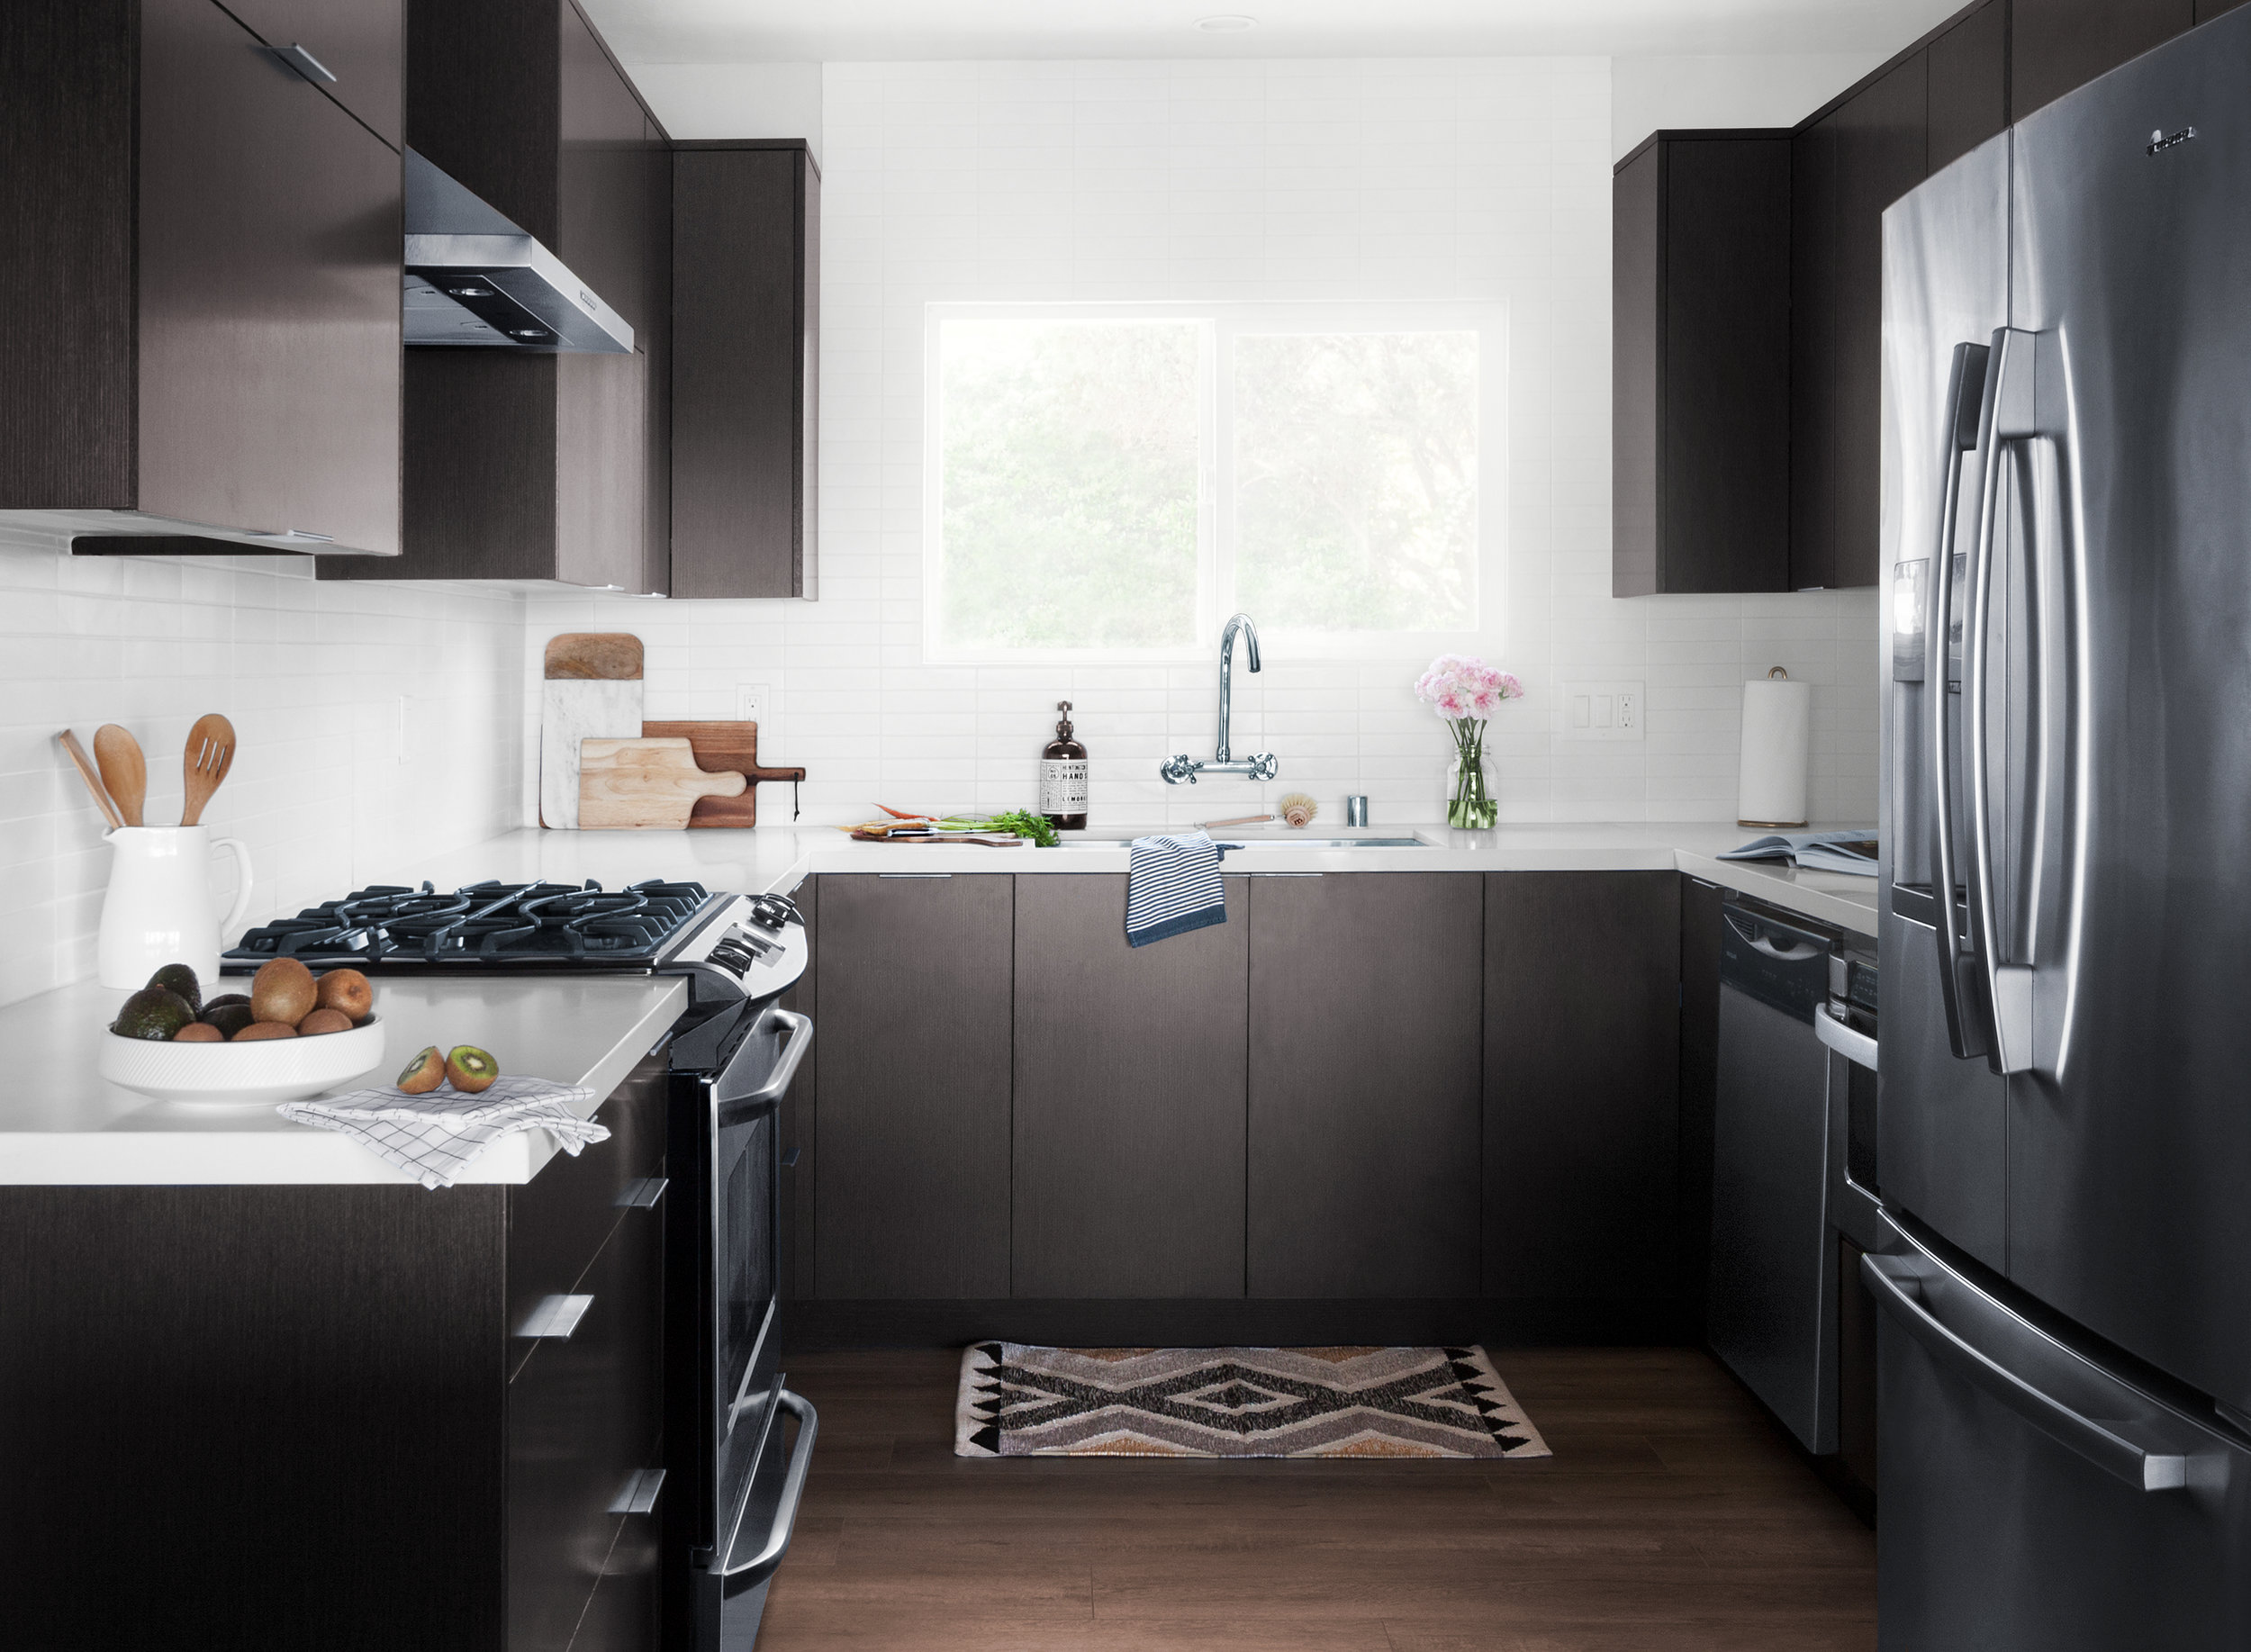 interior-photography-black-and-white-kitchen.jpg